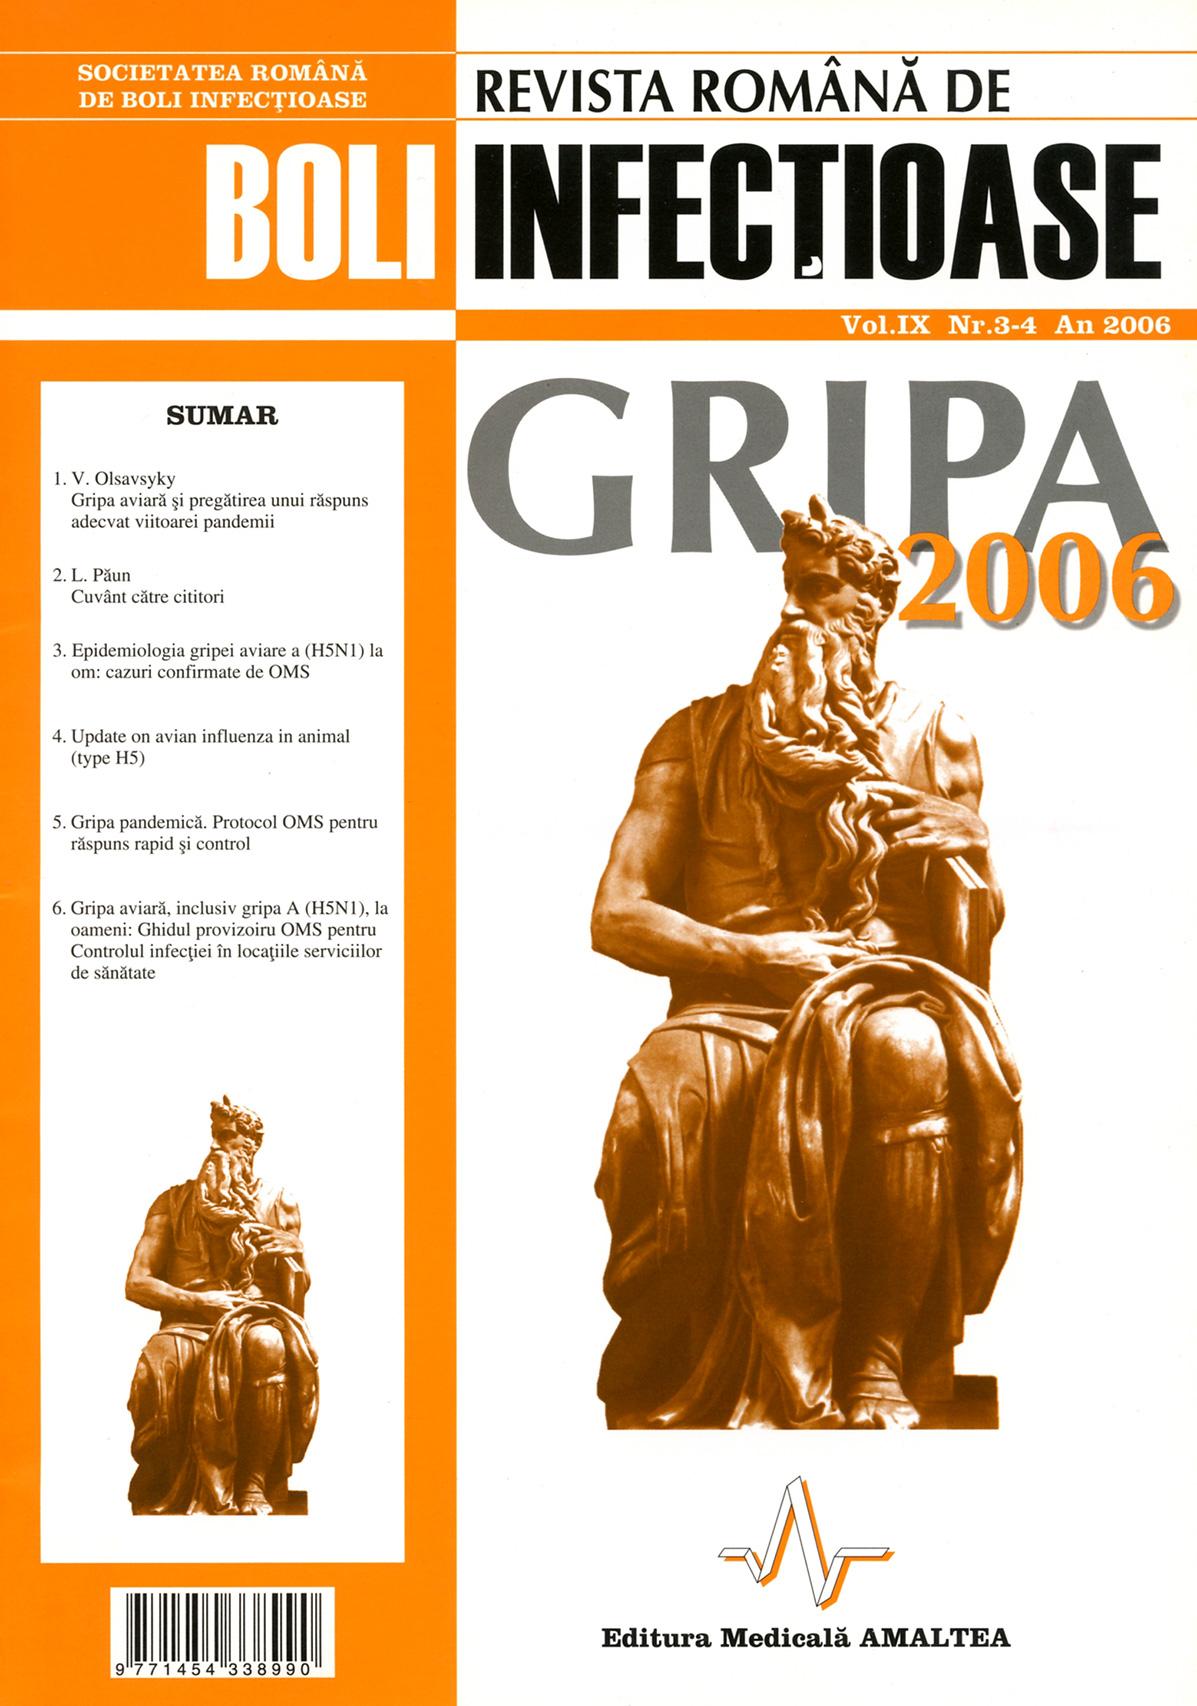 Revista Romana de Boli Infectioase | Vol. IX, No. 3-4, 2006